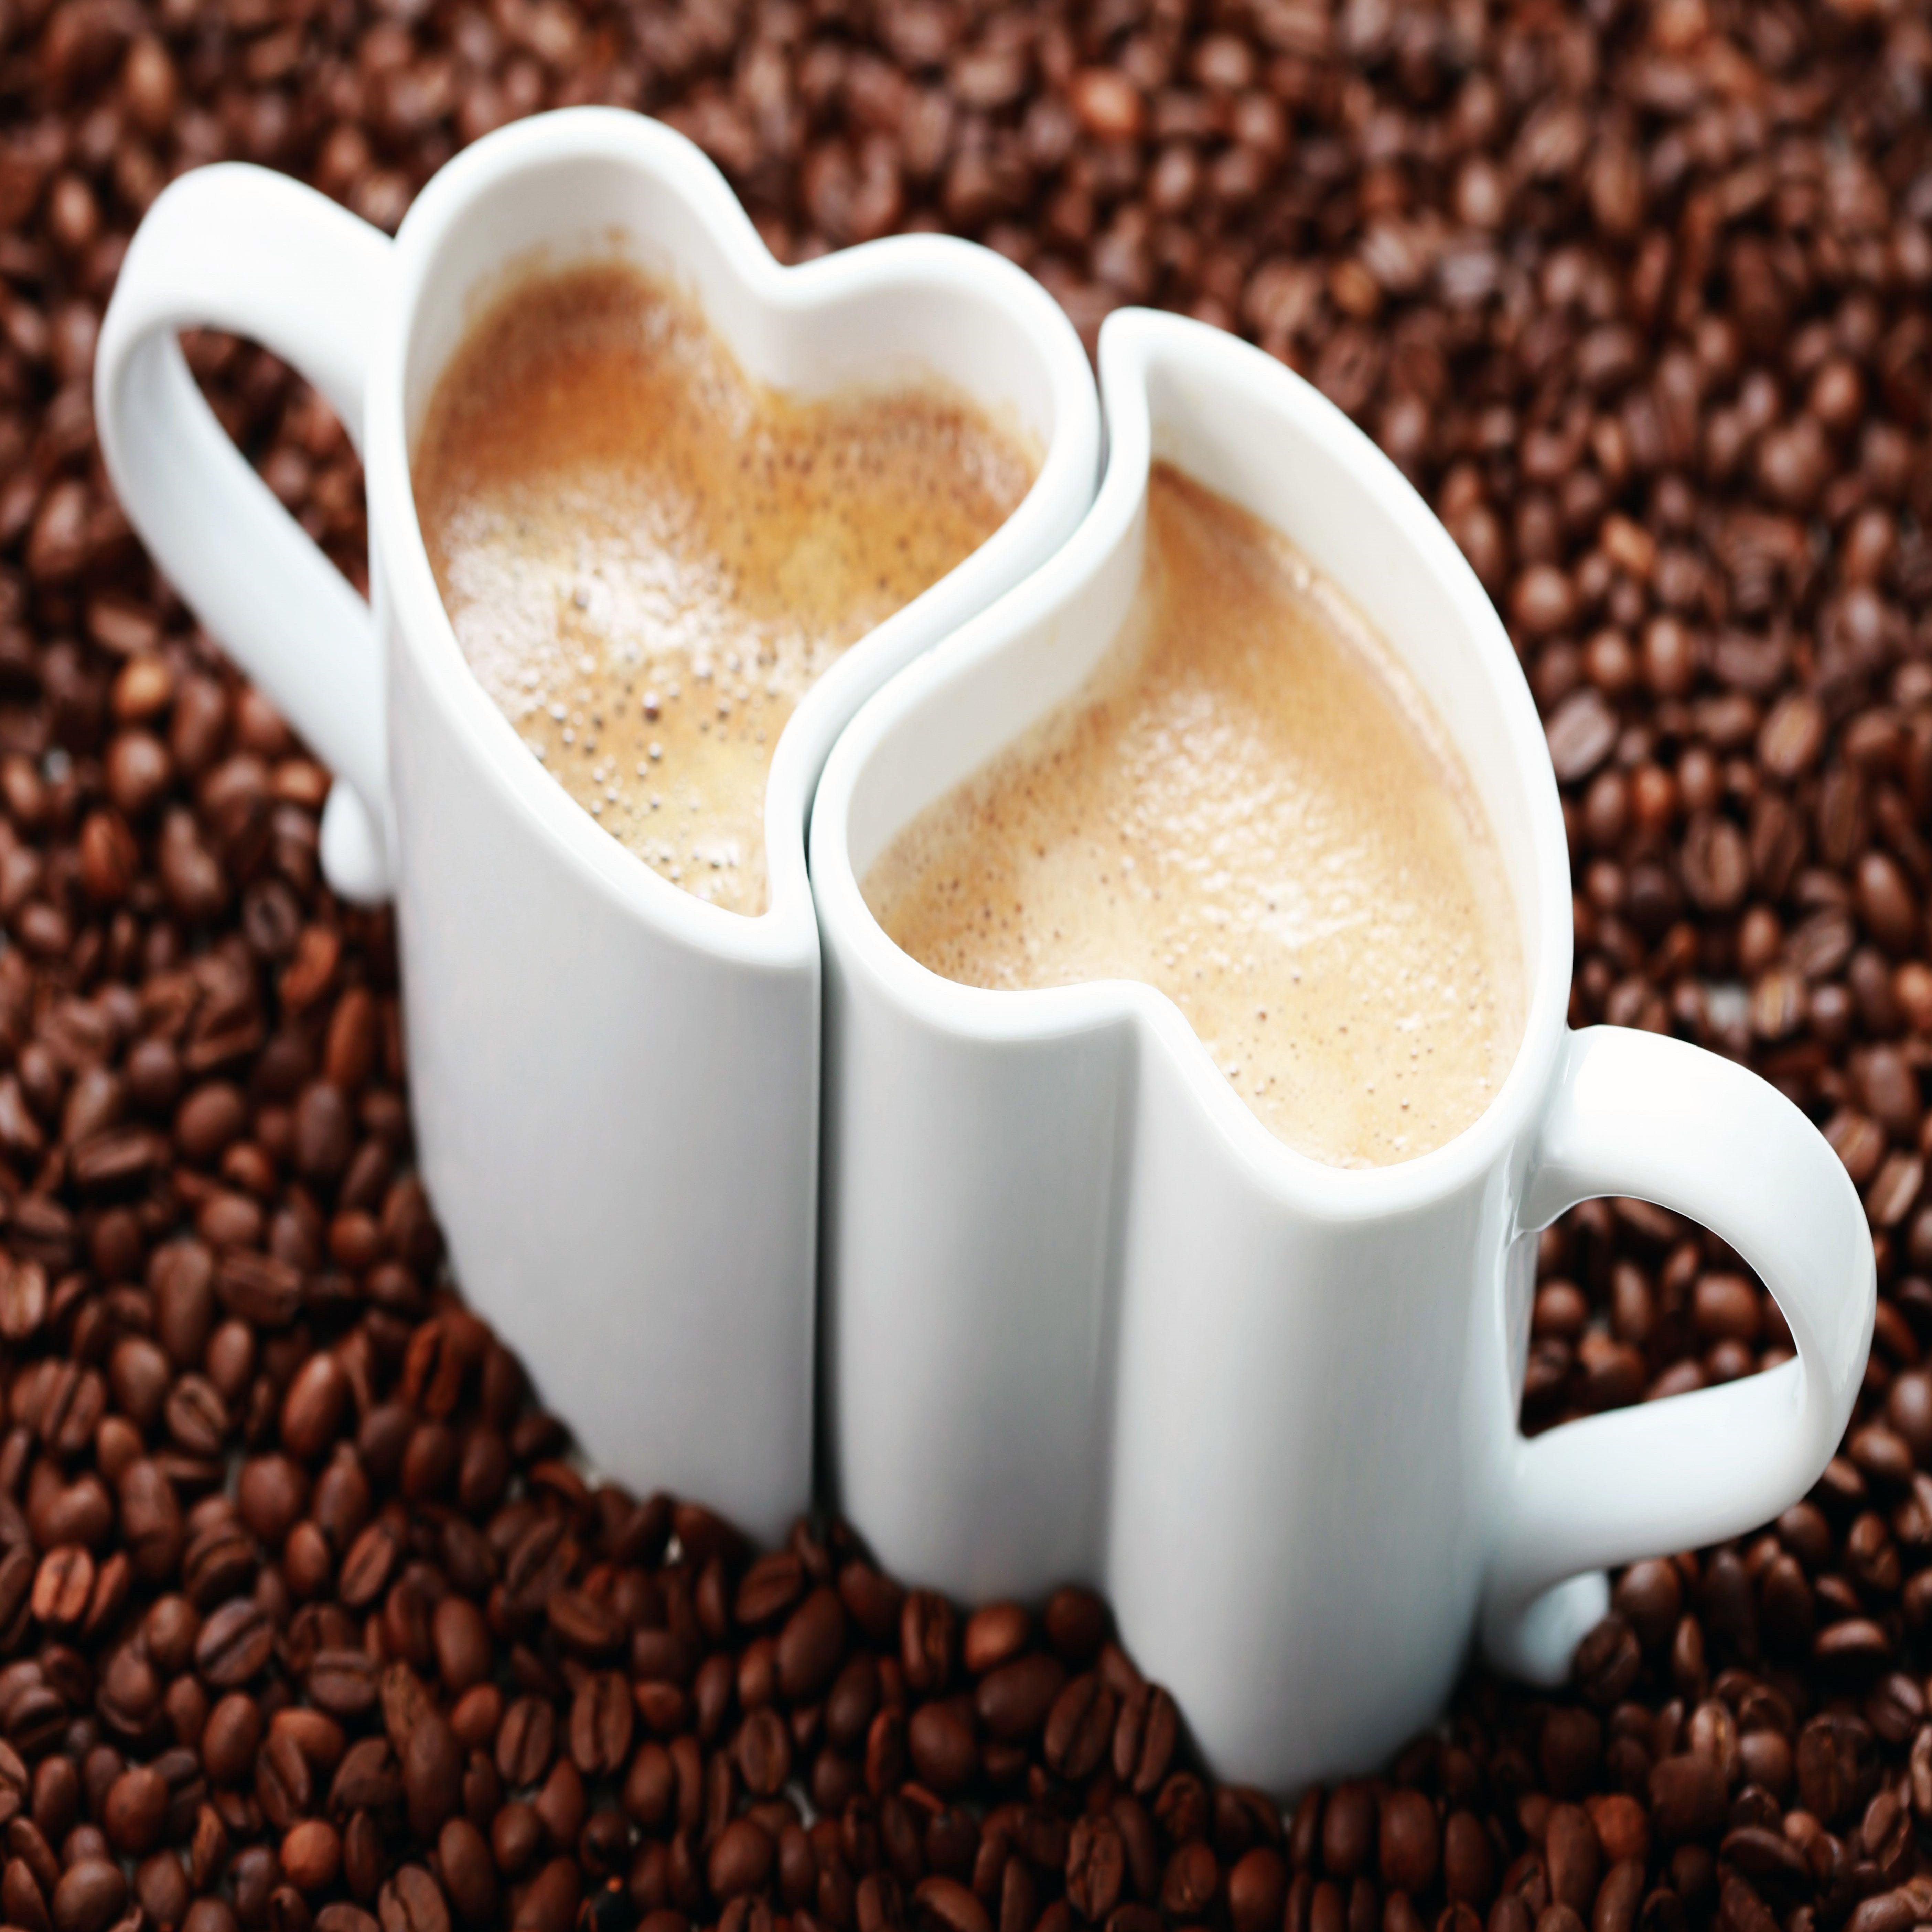 Photo Valentines Day Heart Coffee Grain Mug Food Drinks